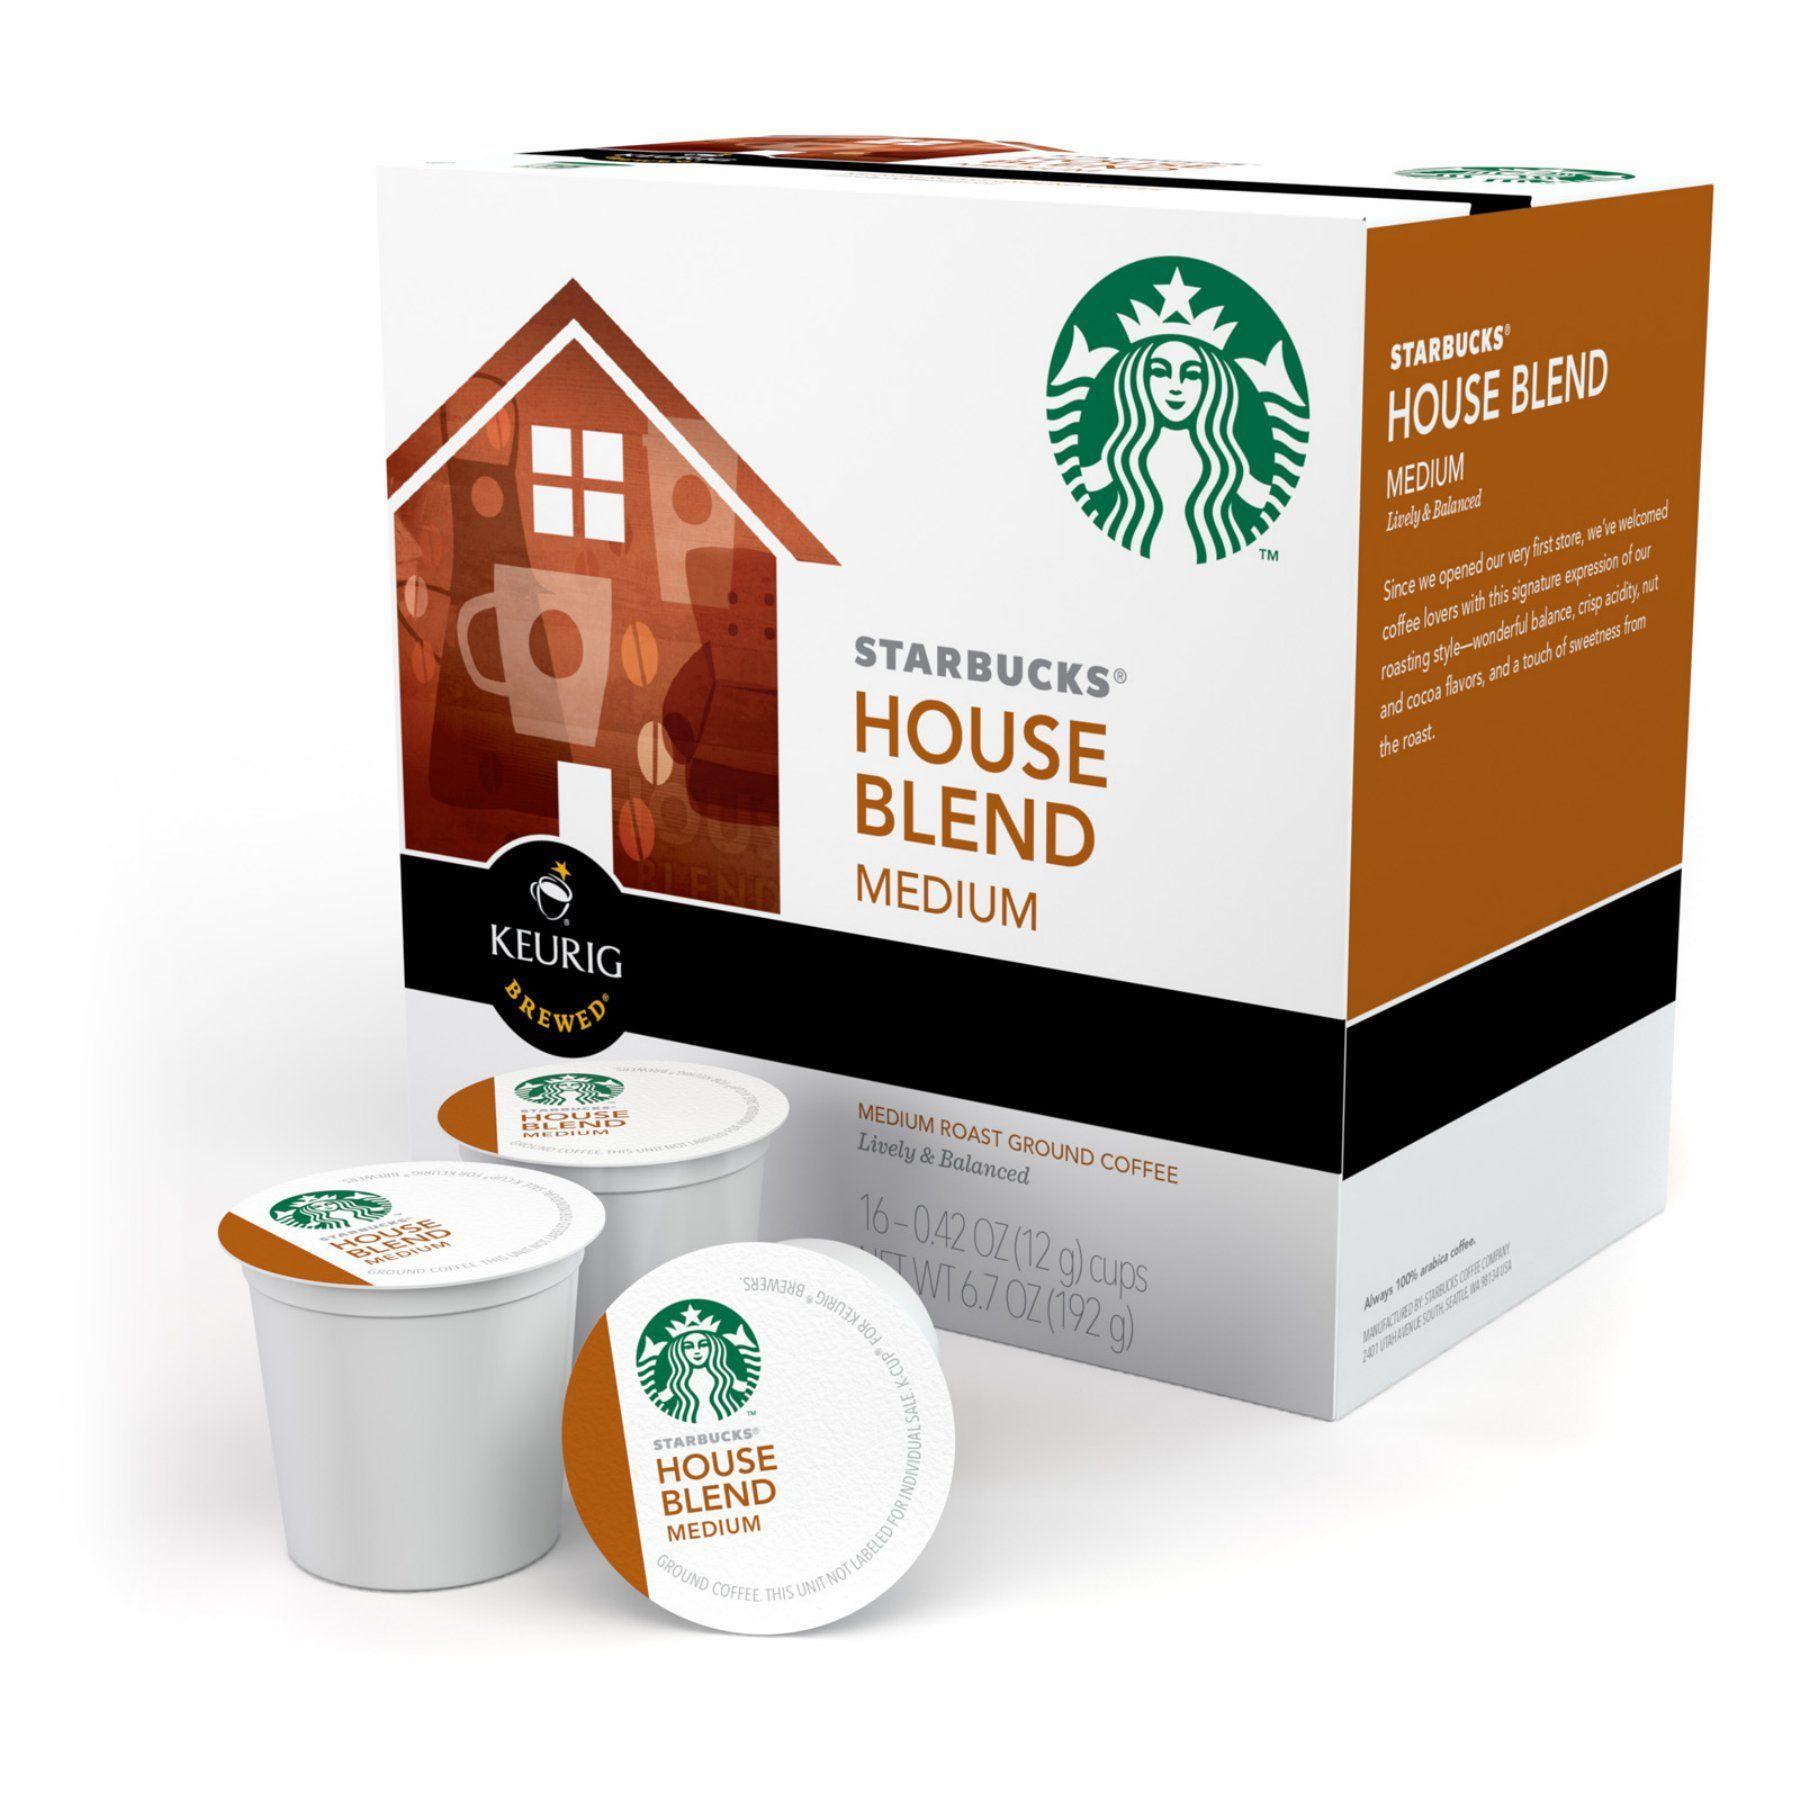 Keurig Starbucks House Blend KCups 96 pk. 111985